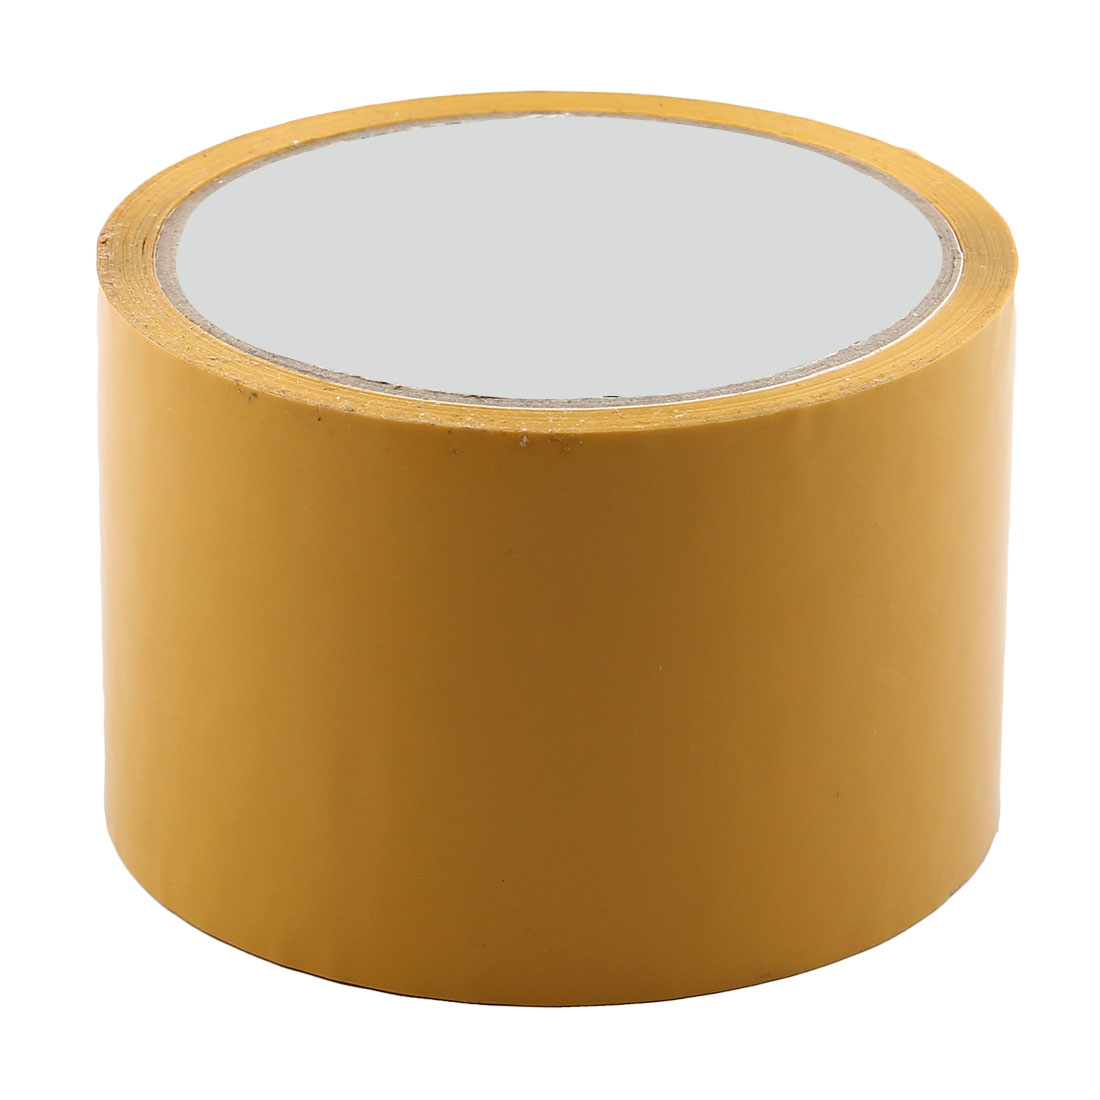 Shipping PVC Box Sealing Adhesive Tape Dark Yellow 2.4'' x 32.8 Yards(98.4 Ft)